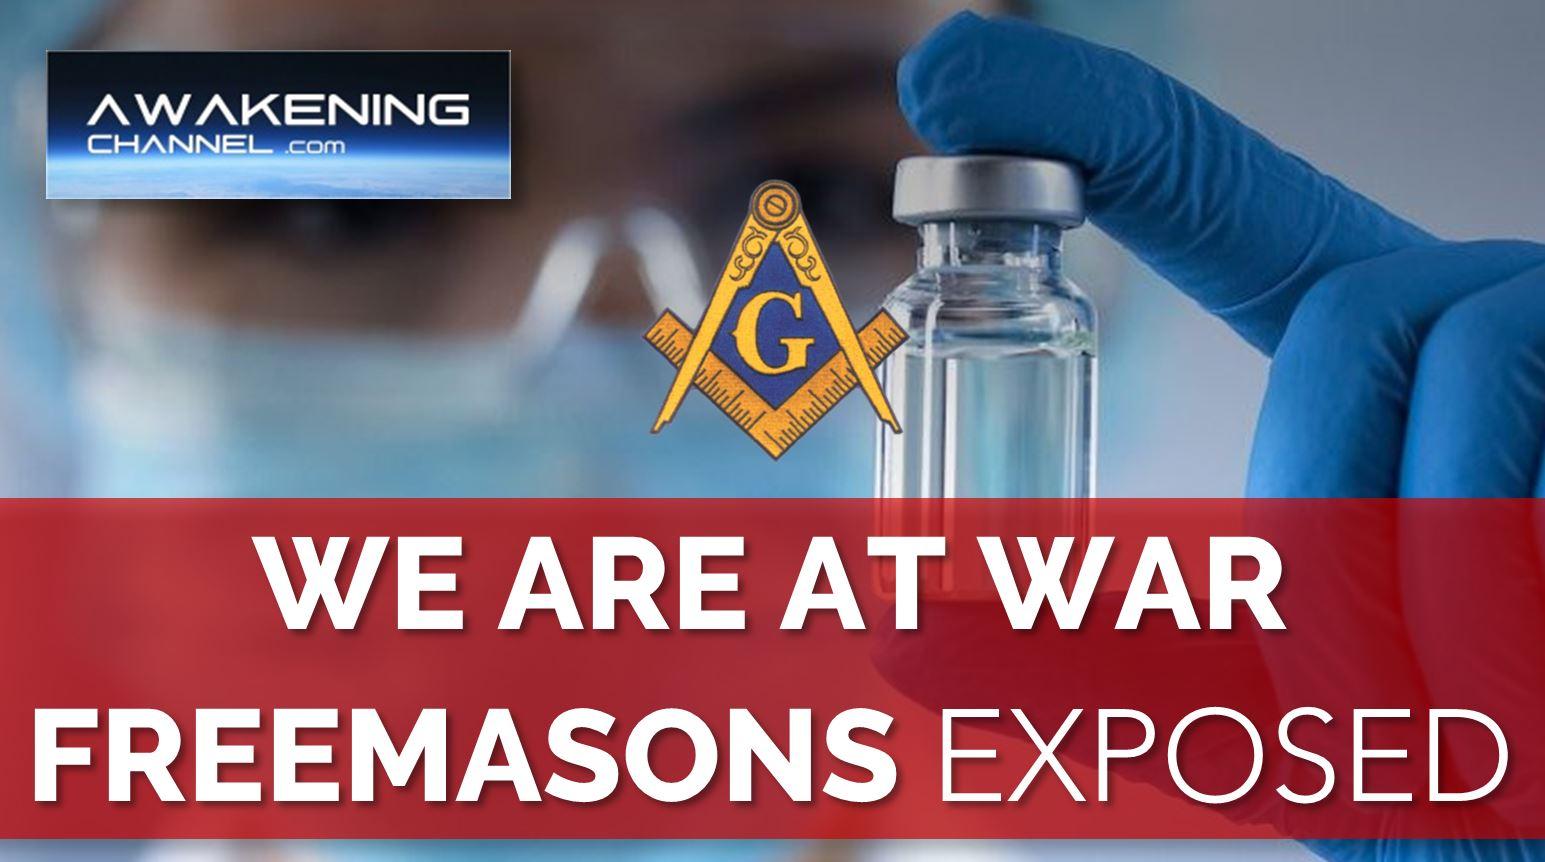 WE ARE AT WAR, Freemasonry Exposed